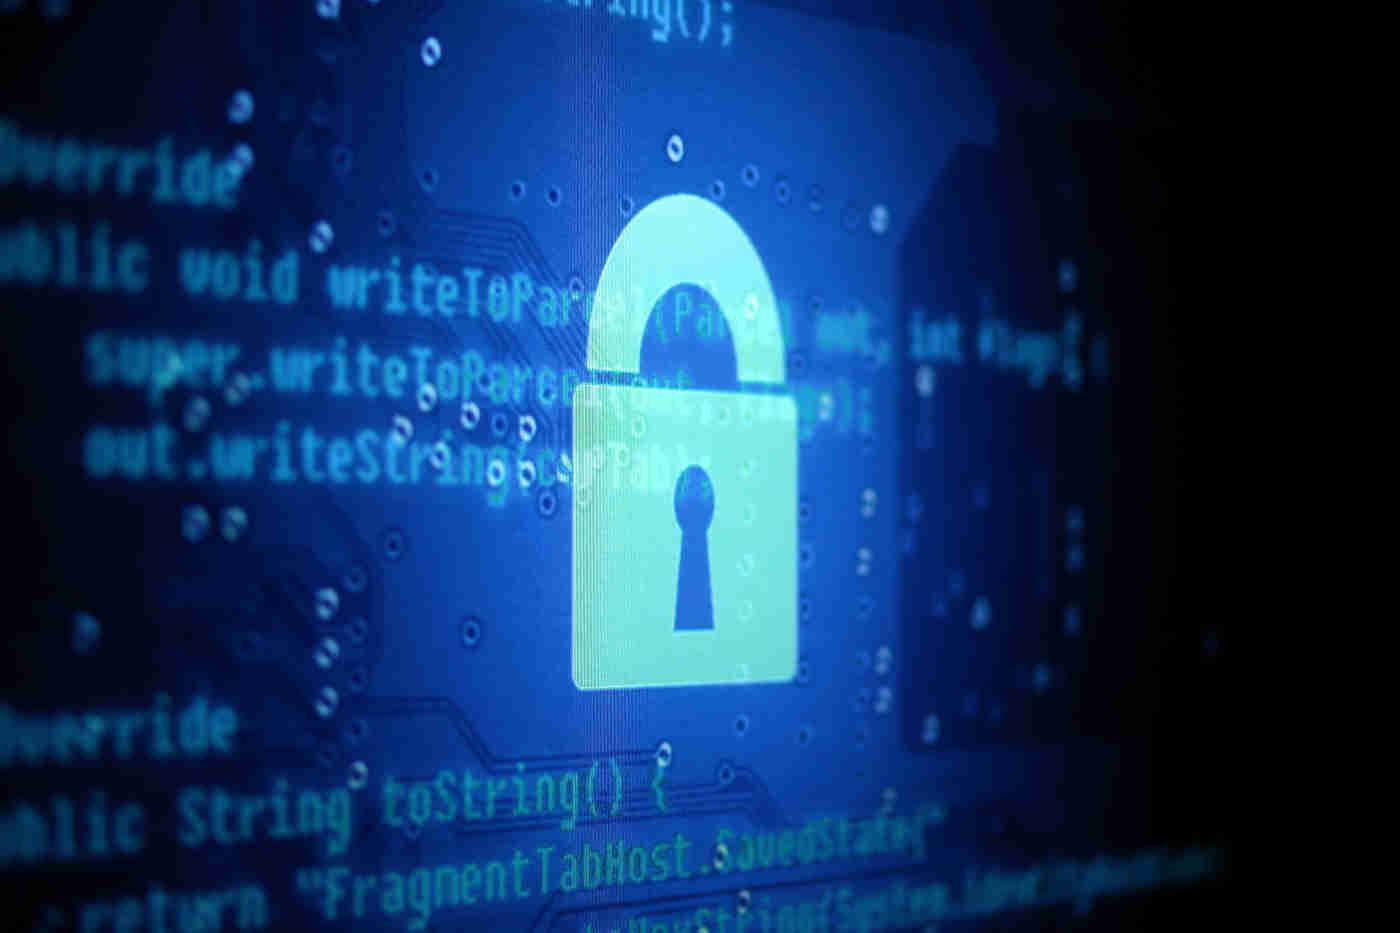 ➤ 10 Simple Ways to Secure Your Website • Perpetual βeta